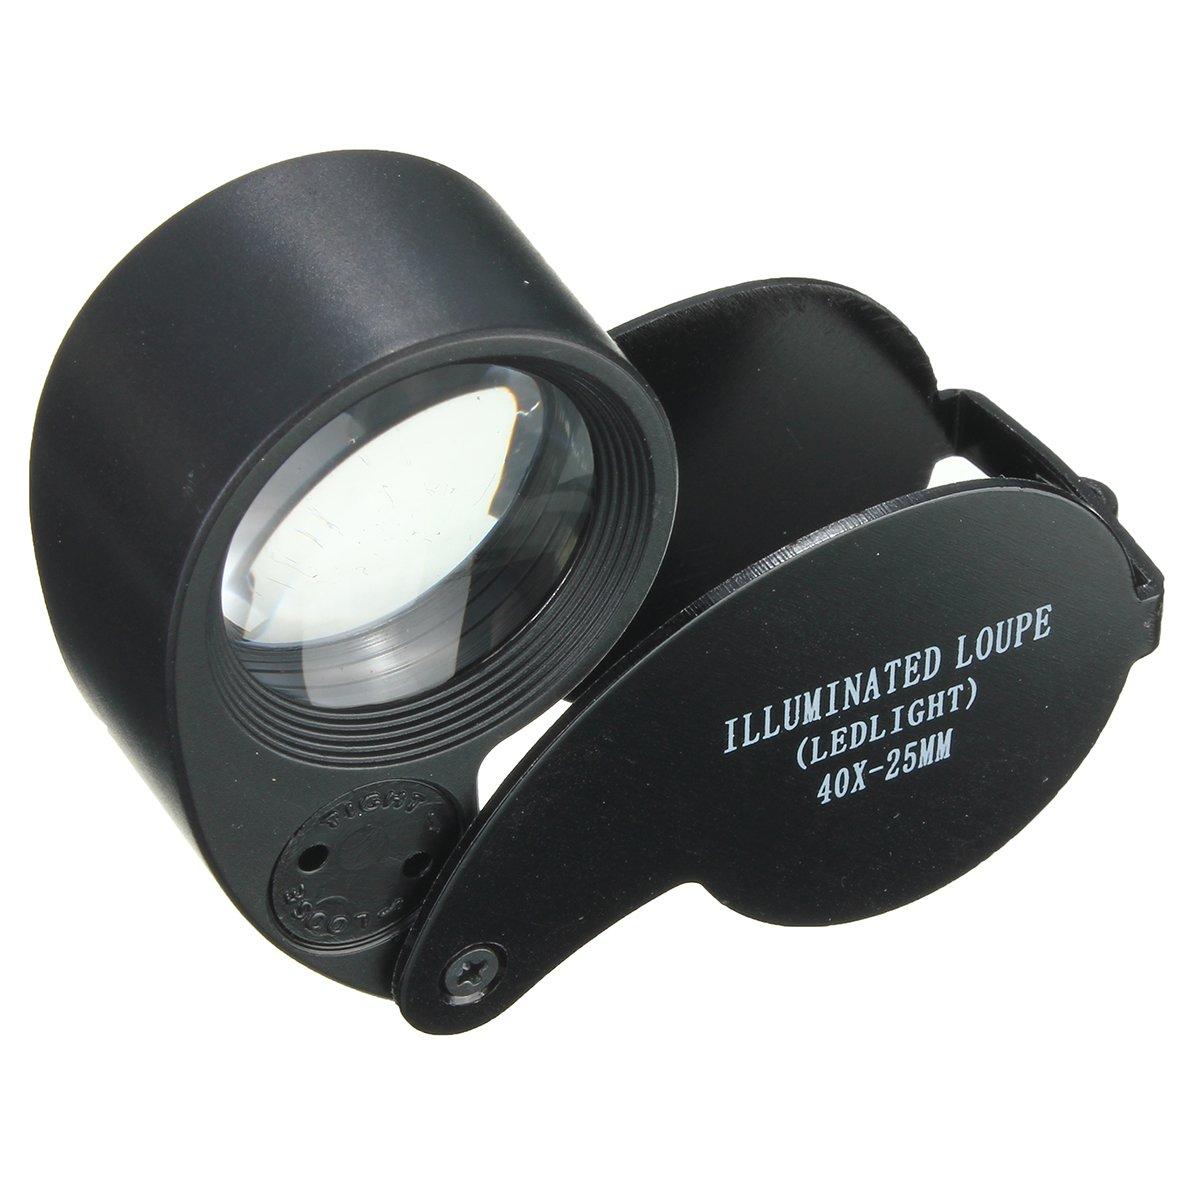 Jewelry And Watch - Eye Watch Magnifier Glass Led Light Jewelry Lens Loupe 25mm - 1PCs